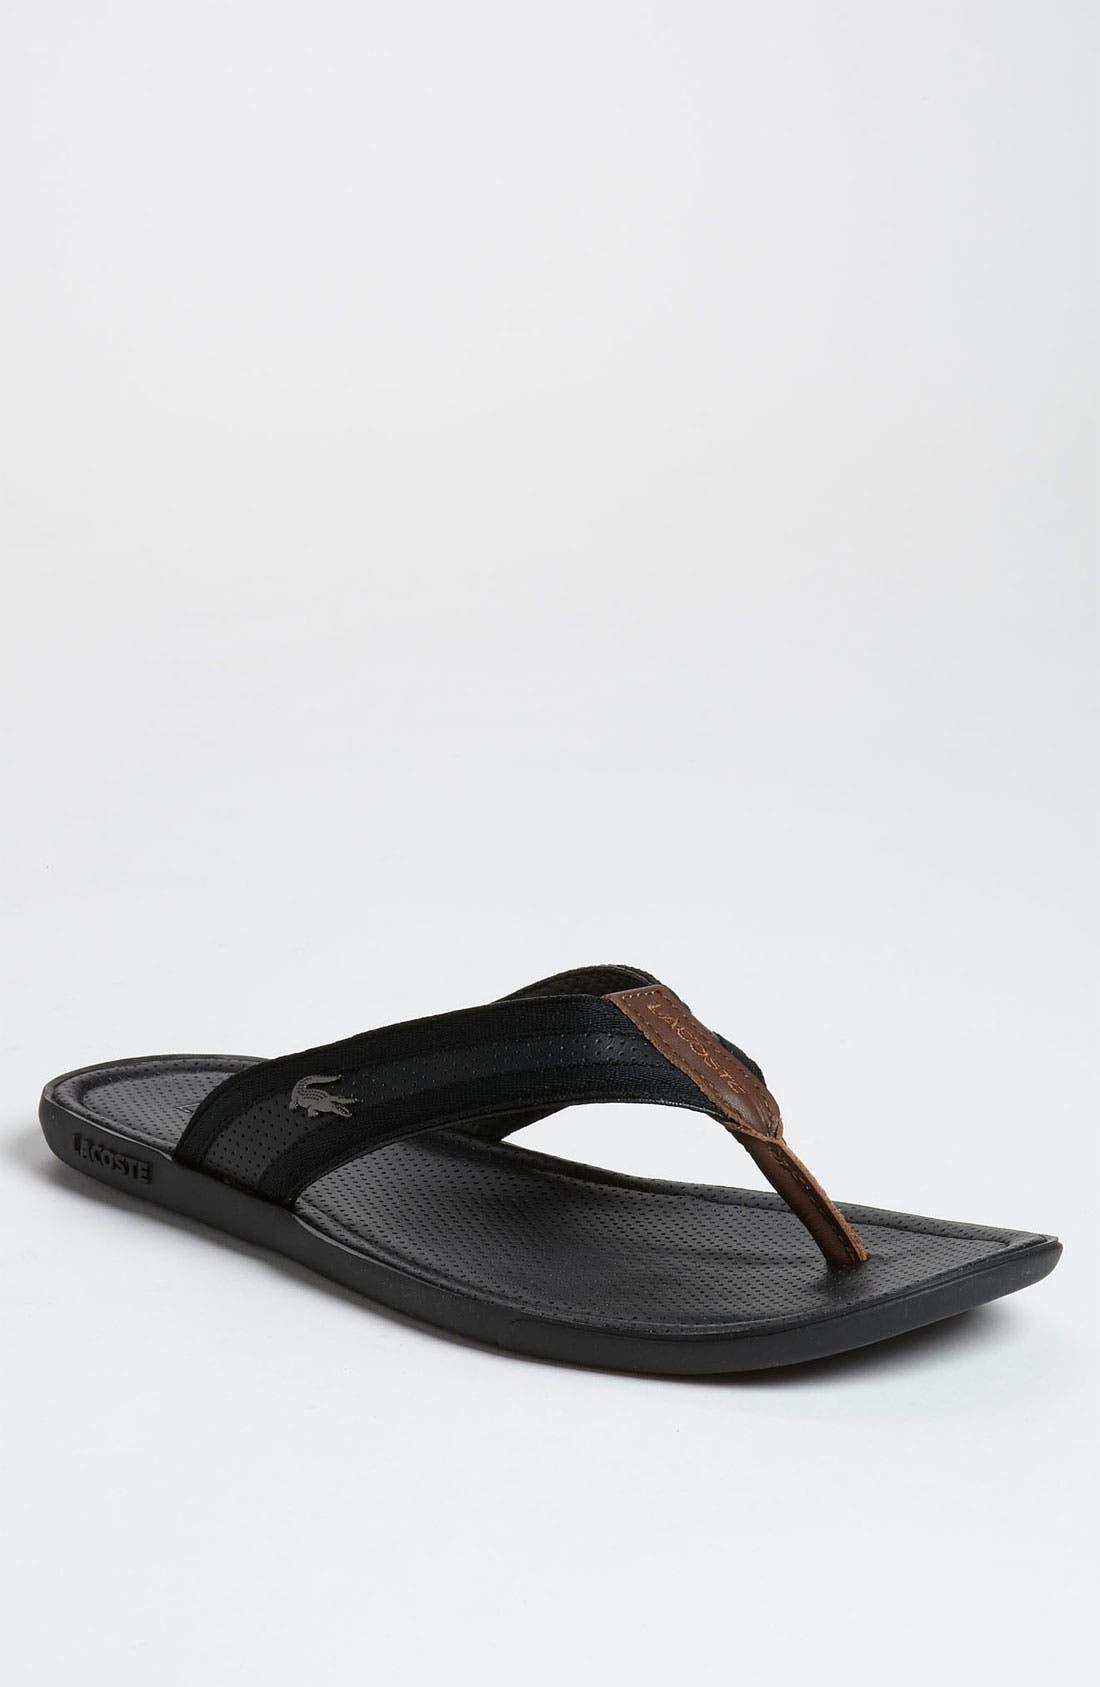 Alternate Image 1 Selected - Lacoste 'Carros 4' Flip Flop (Online Only)